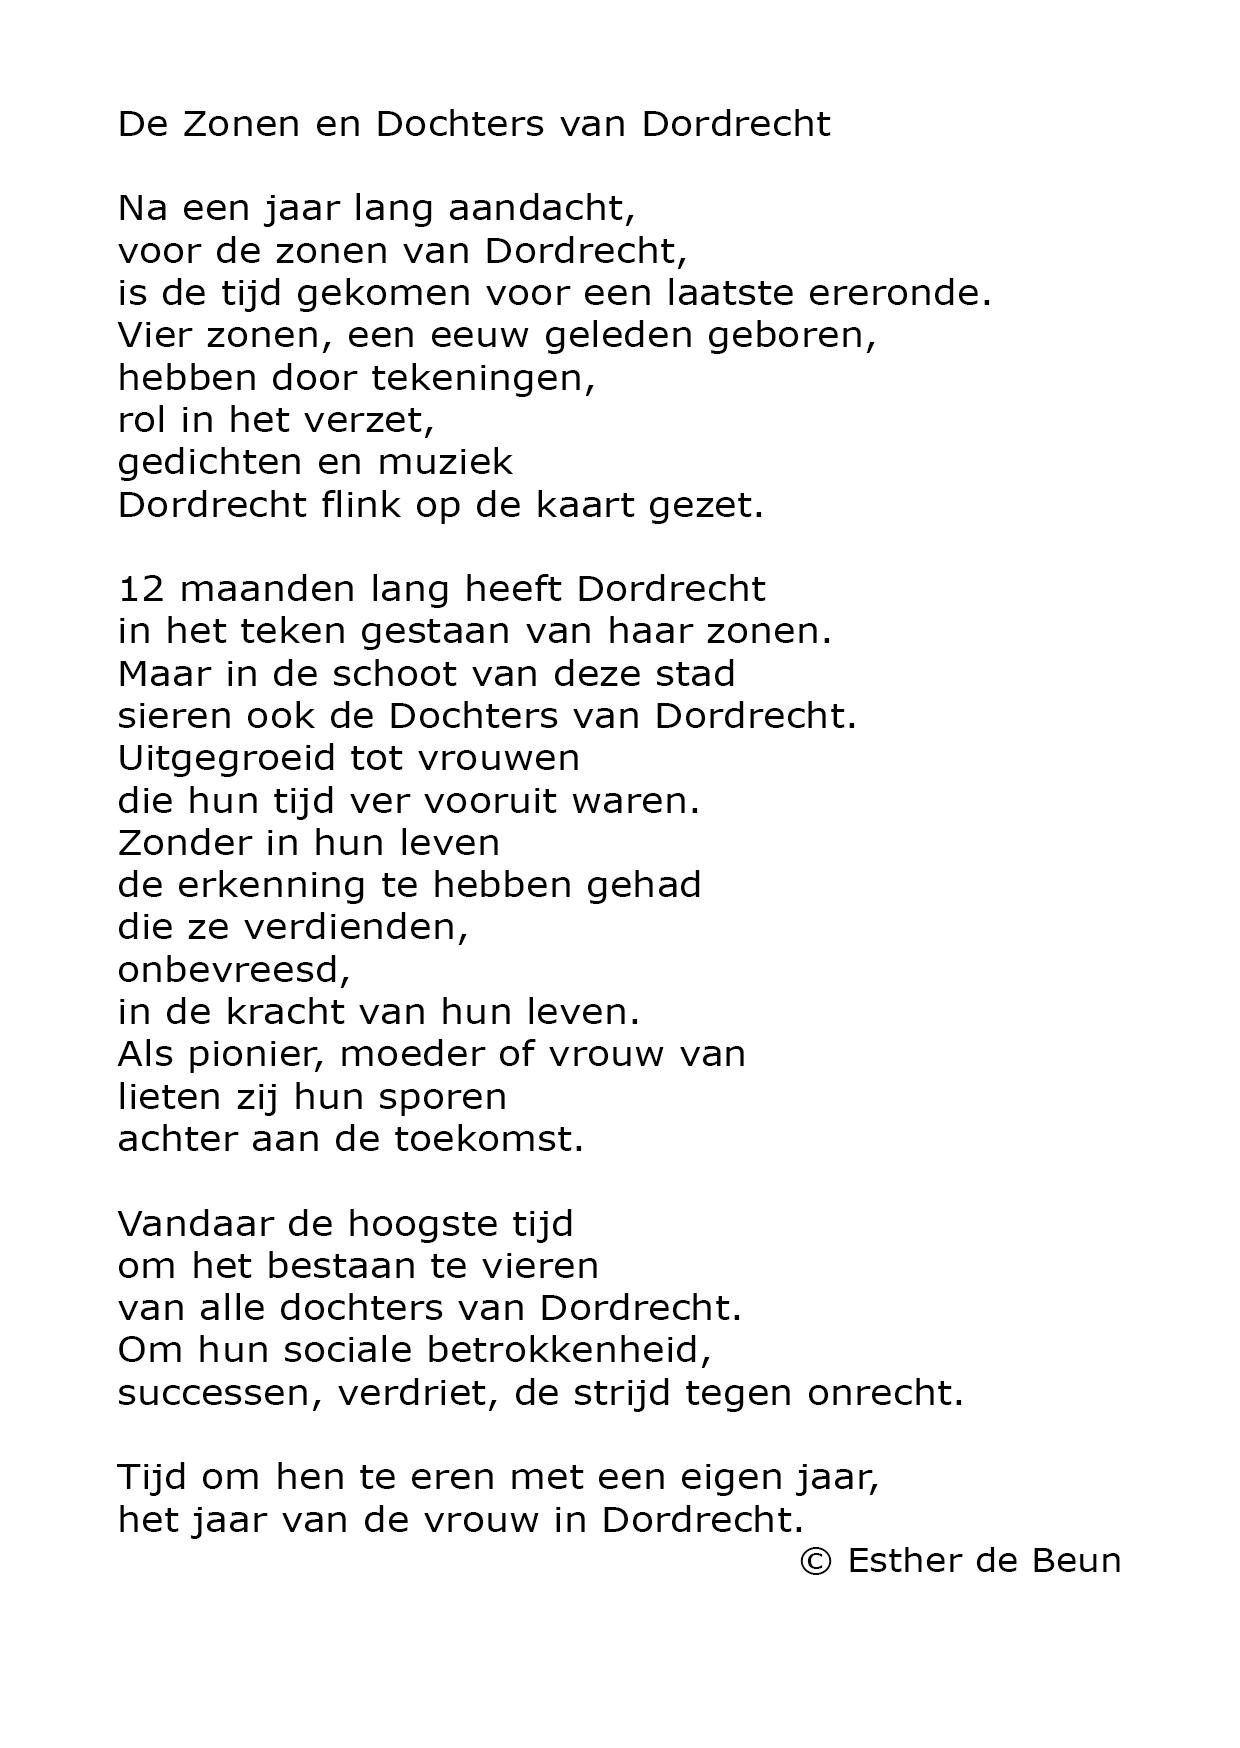 Gedichten Esther De Beun Dochters Van Dordrecht